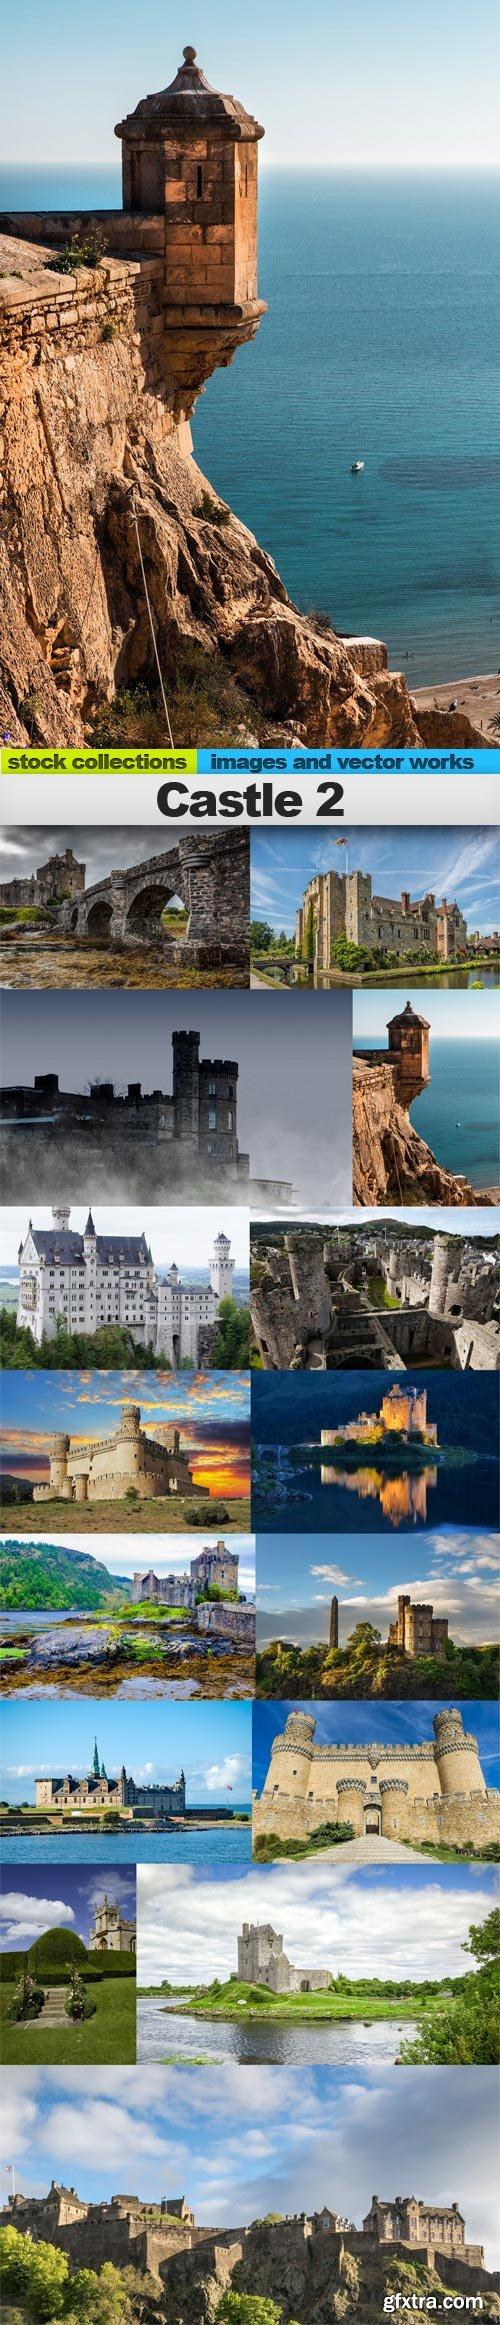 Castle 2, 15 x UHQ JPEG